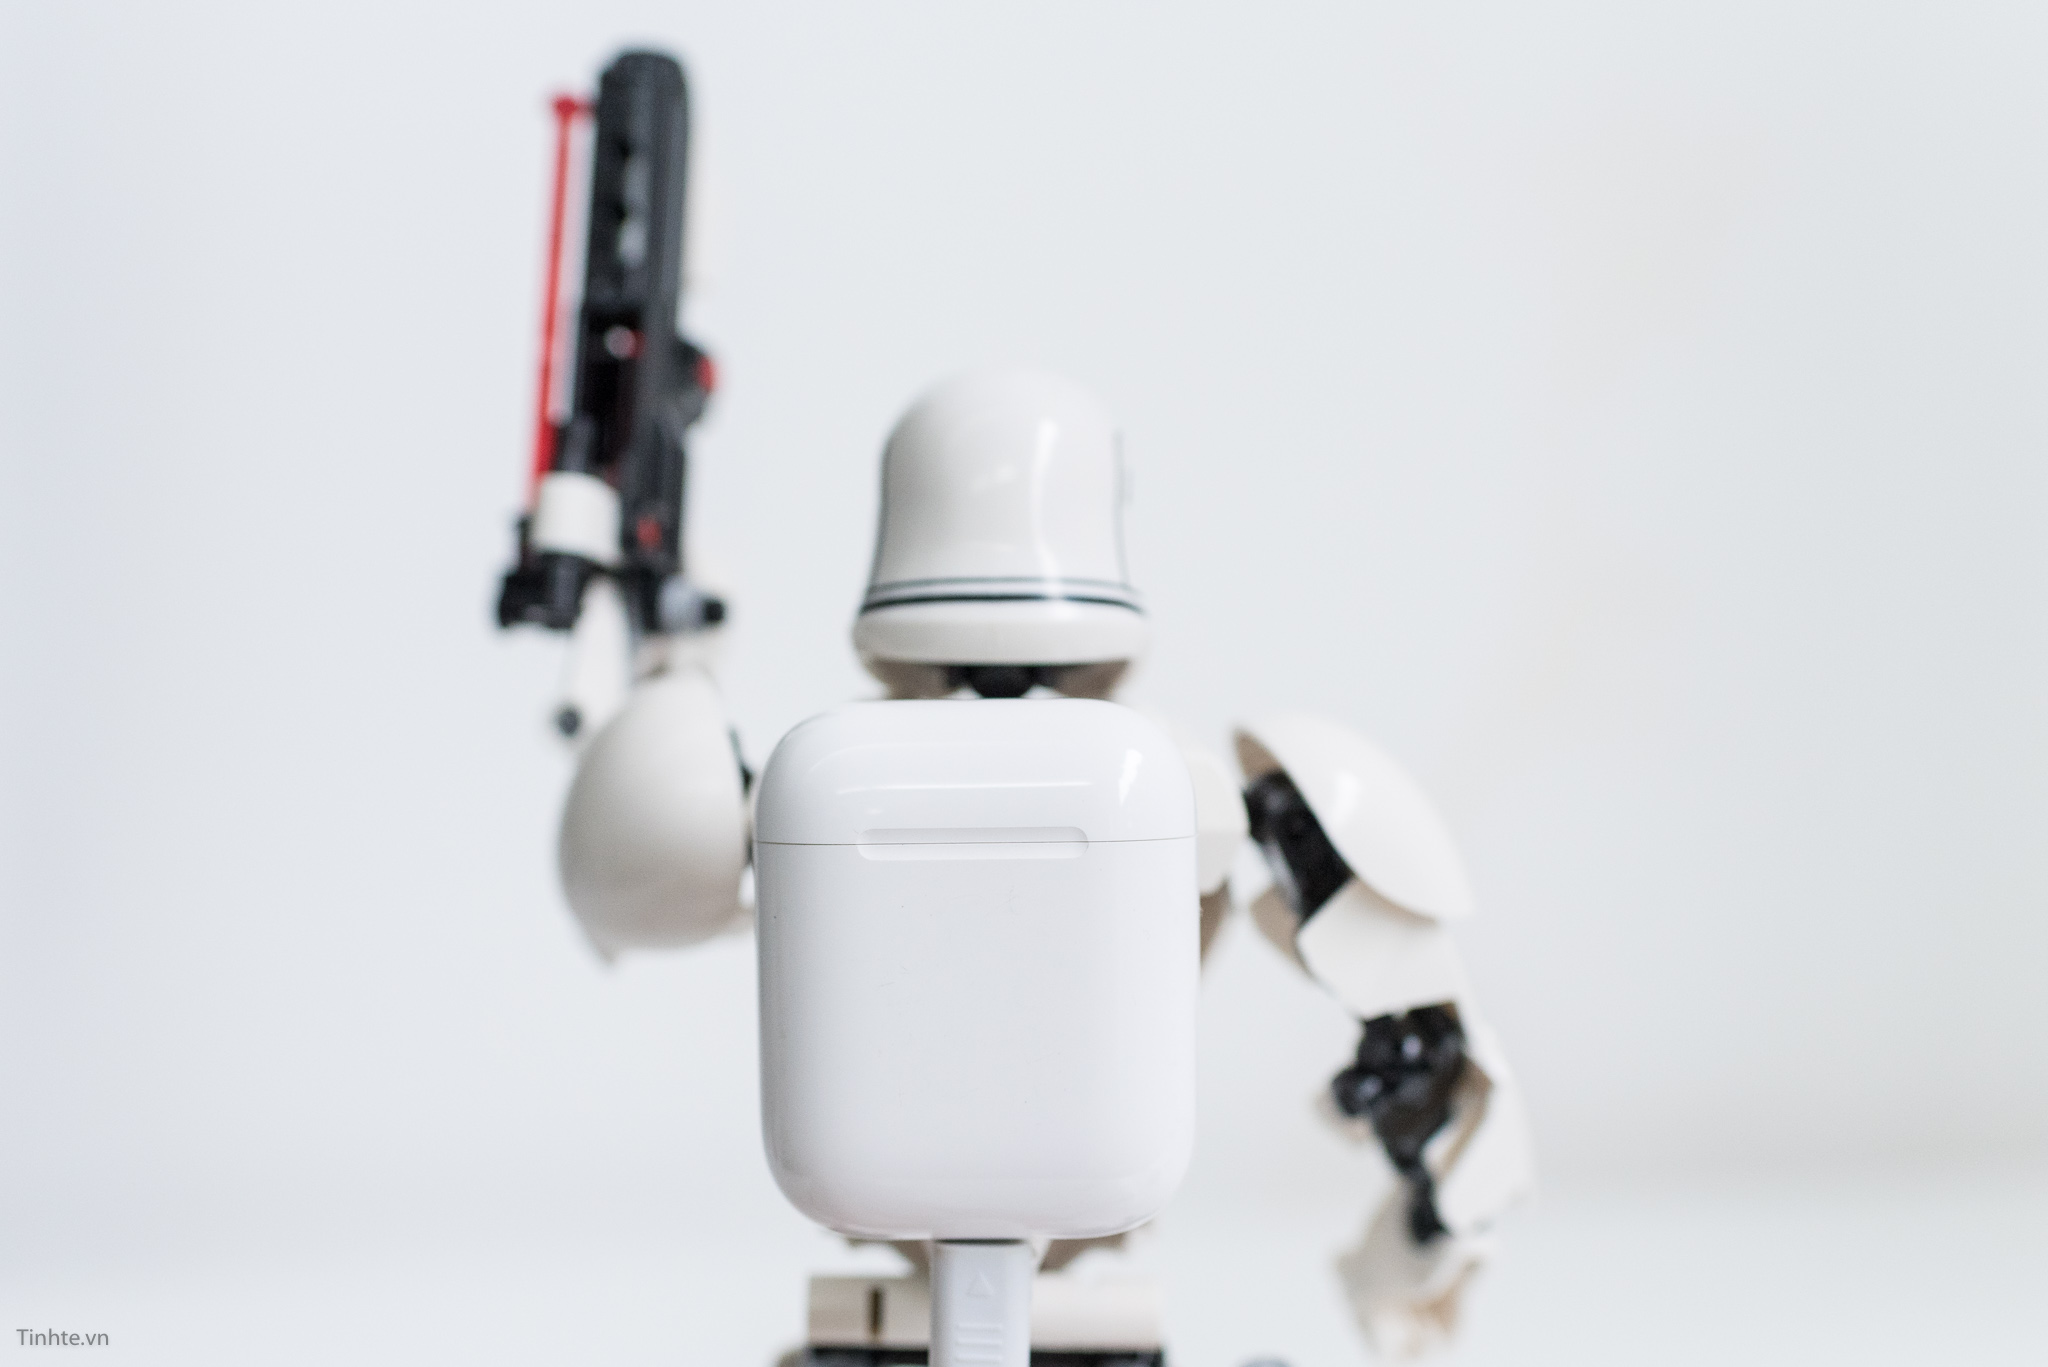 airpods-stormtrooper-tinhte-5.jpg